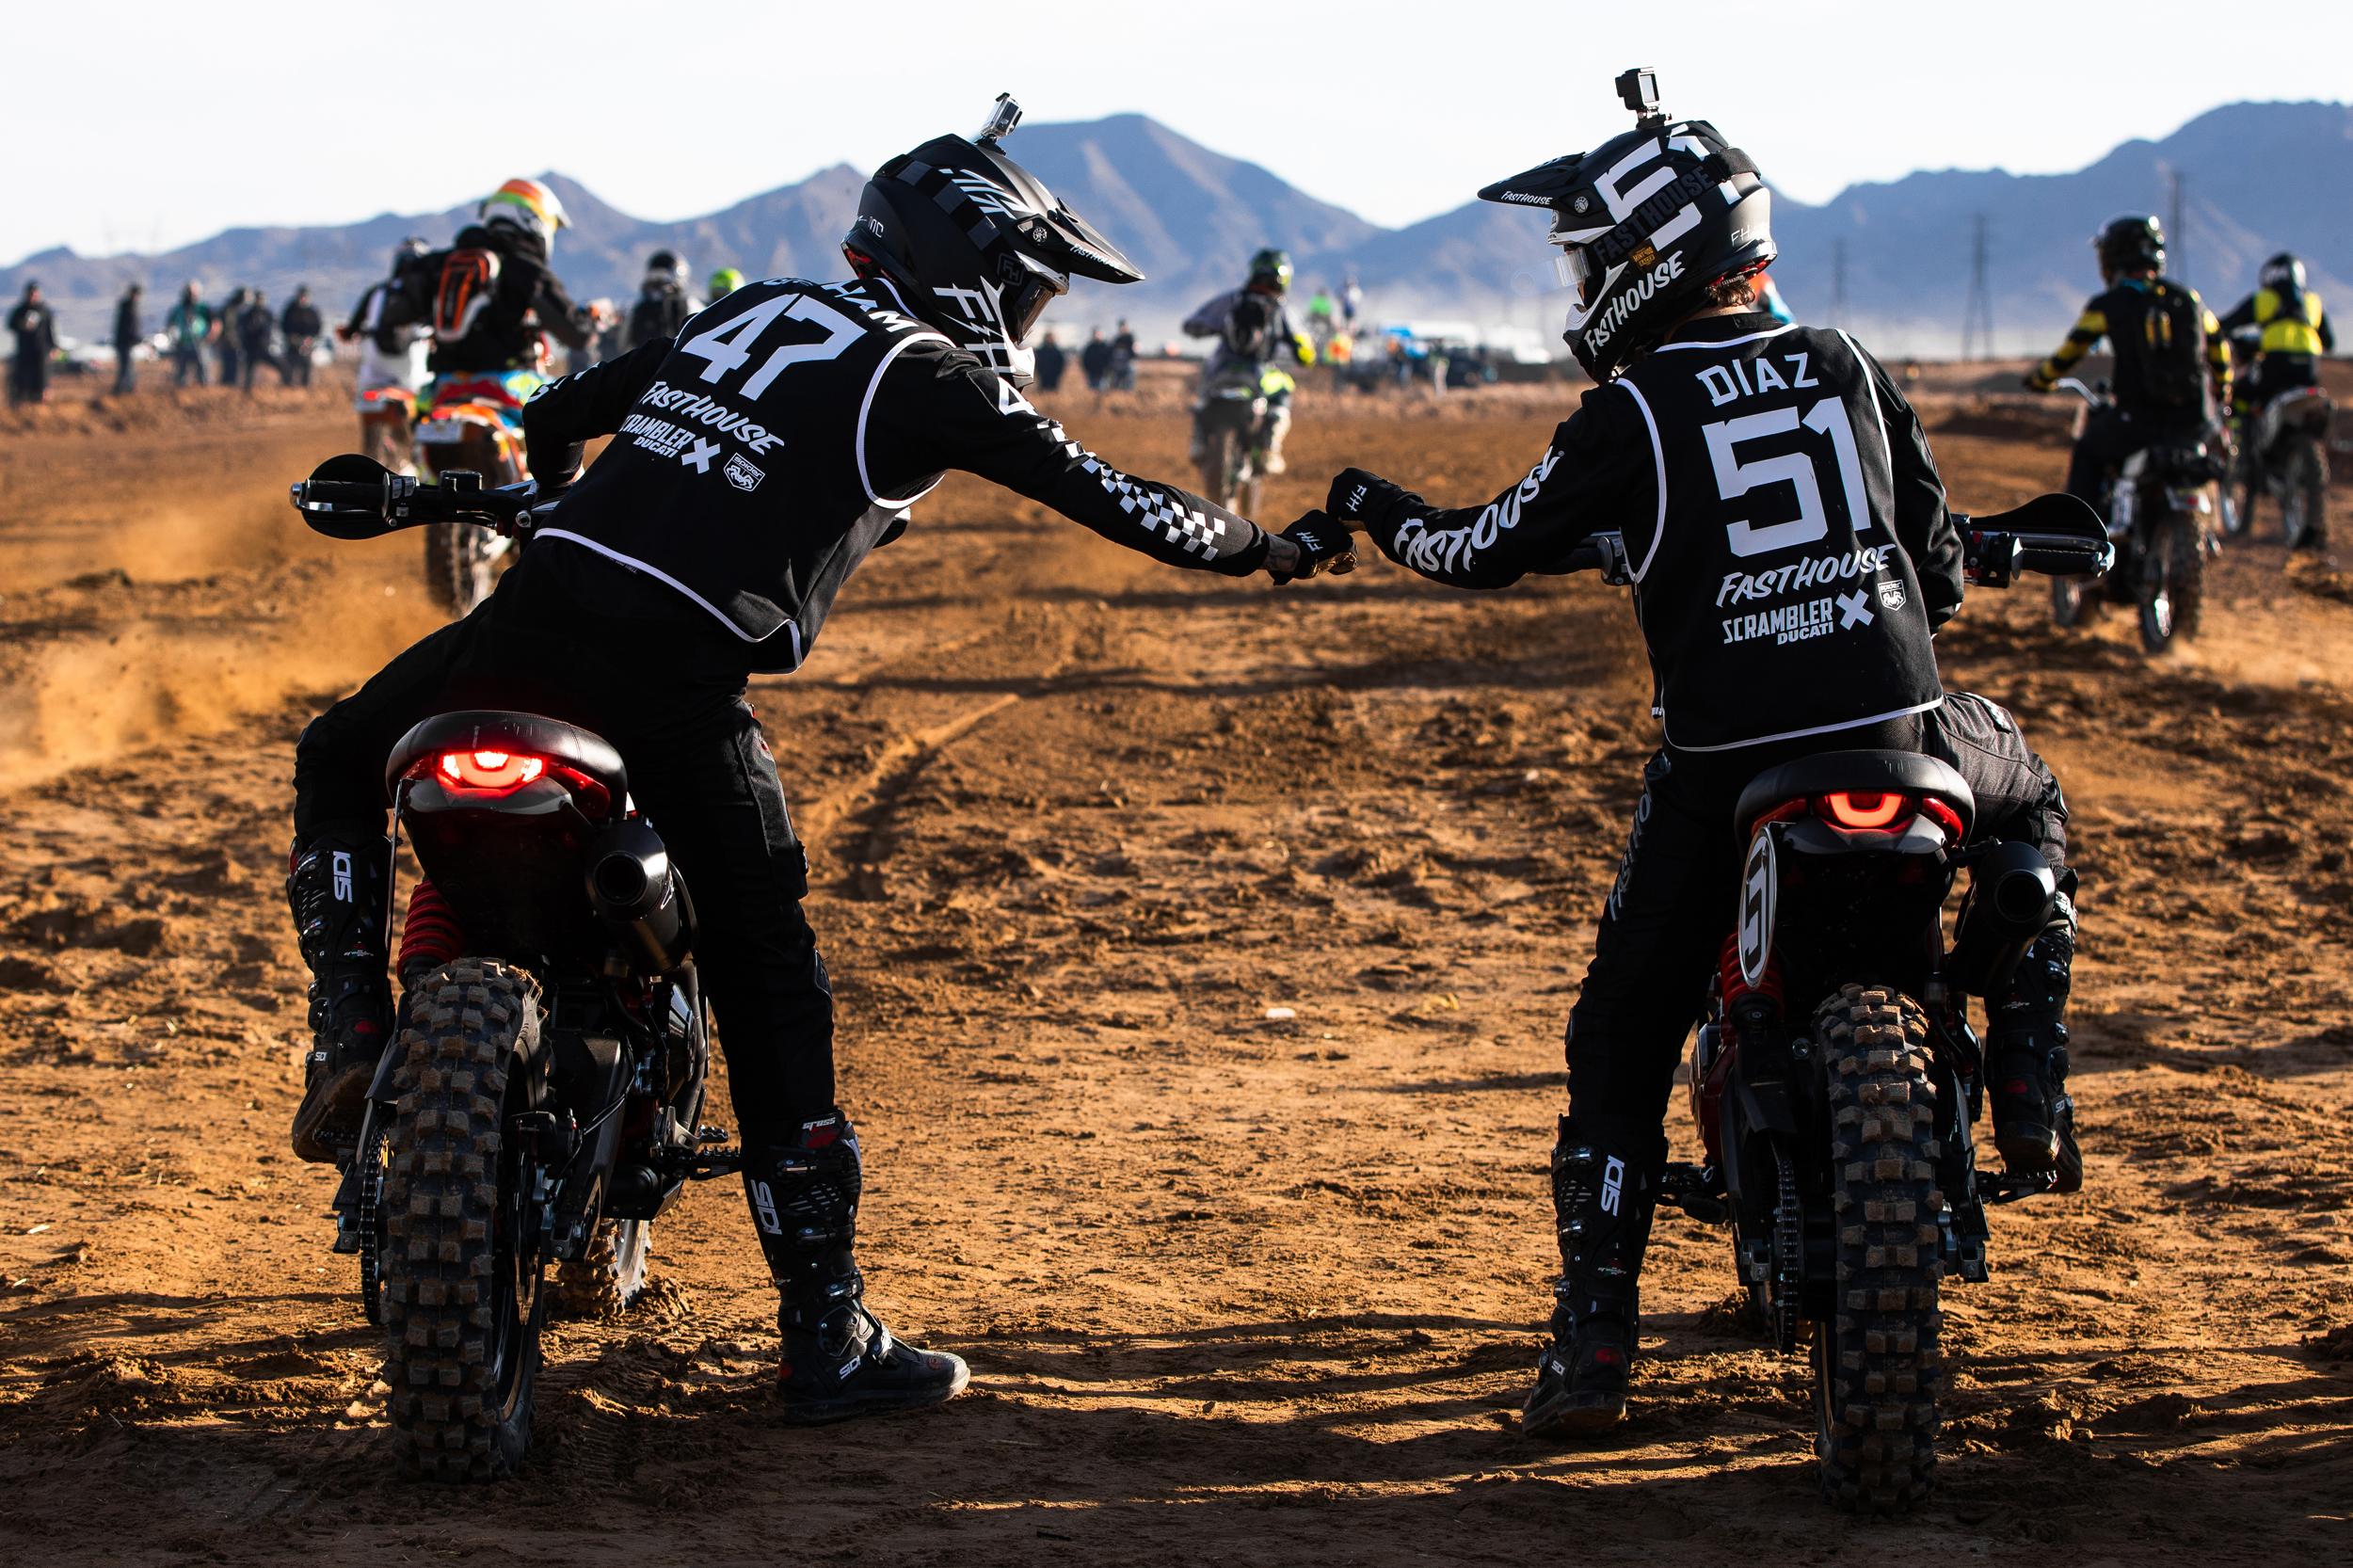 Scrambler Ducati Desert Sled Dominates Inaugural Mint 400 Hooligan Class [4]